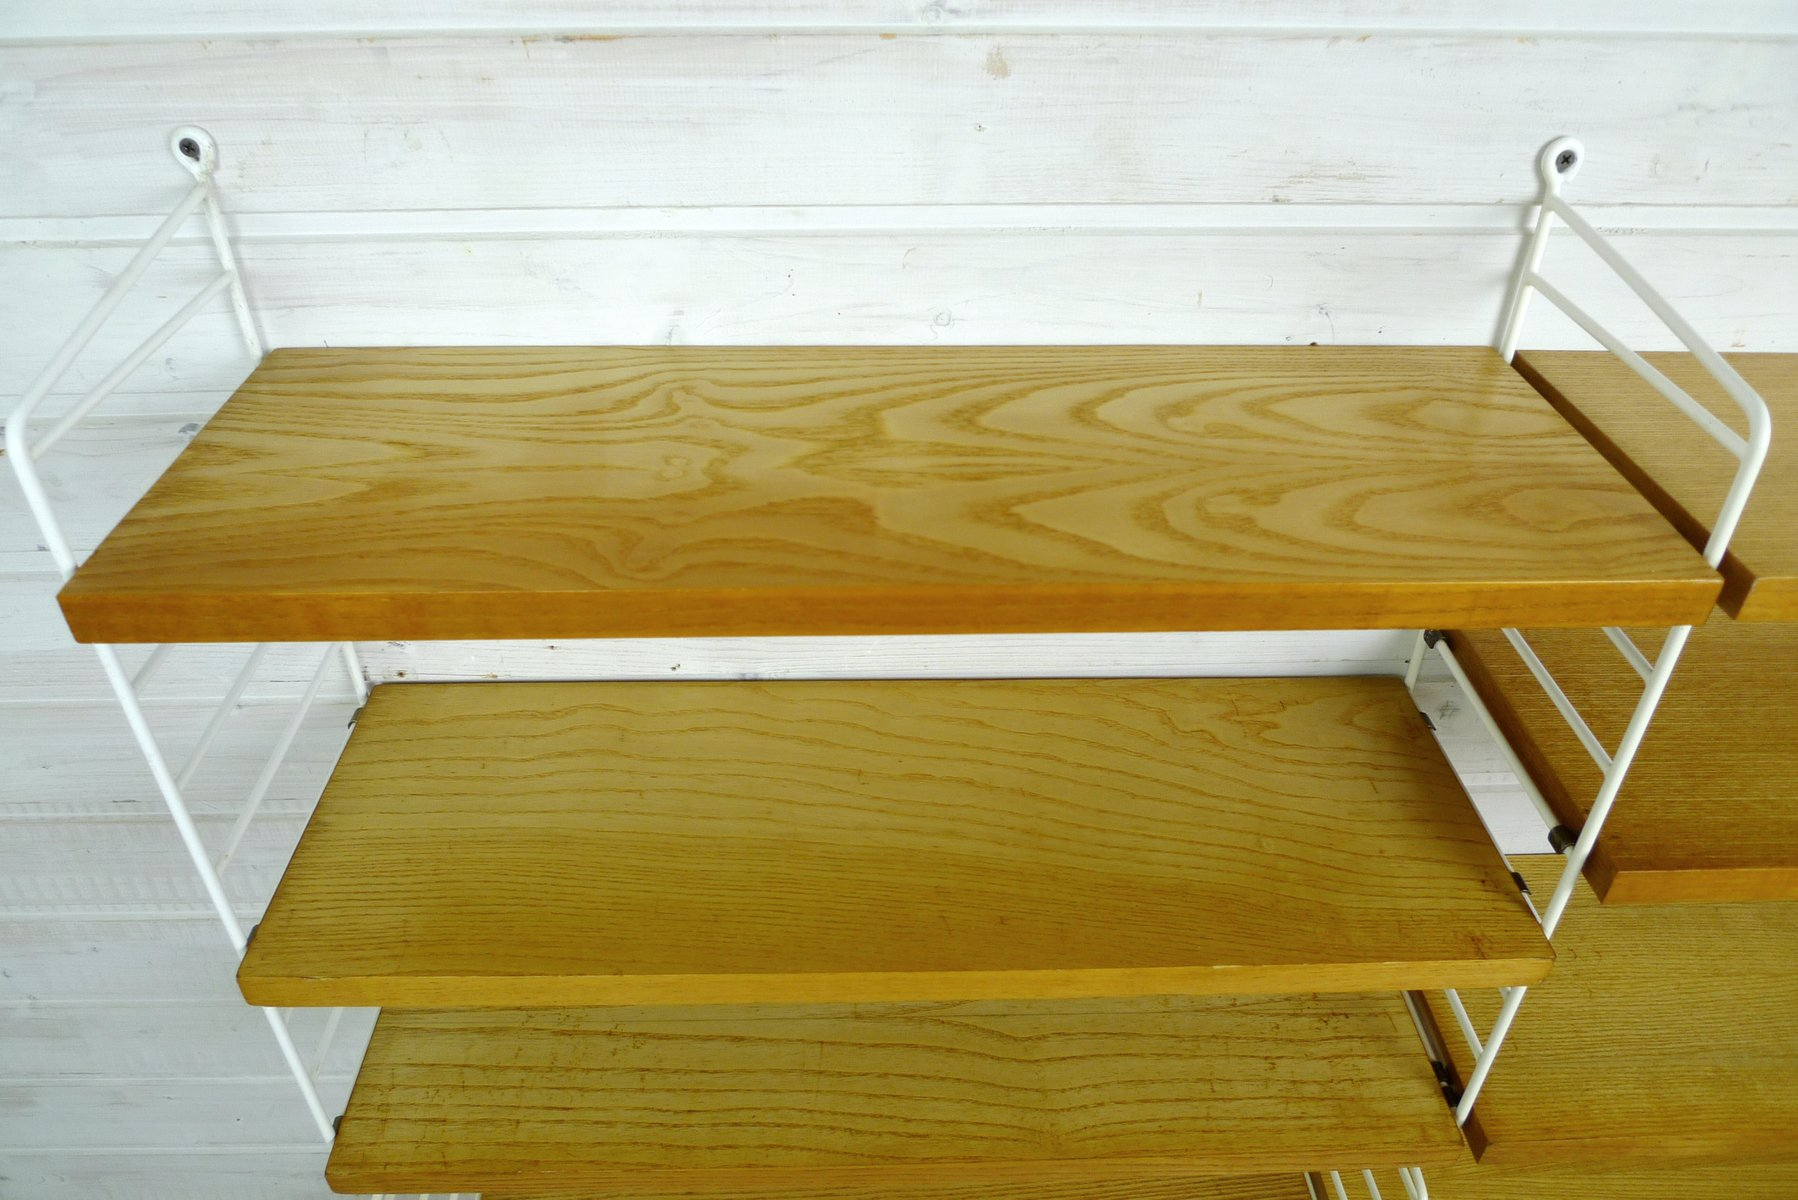 ash wall shelving system by nisse strinning for string design ab 1960s for sale at pamono. Black Bedroom Furniture Sets. Home Design Ideas